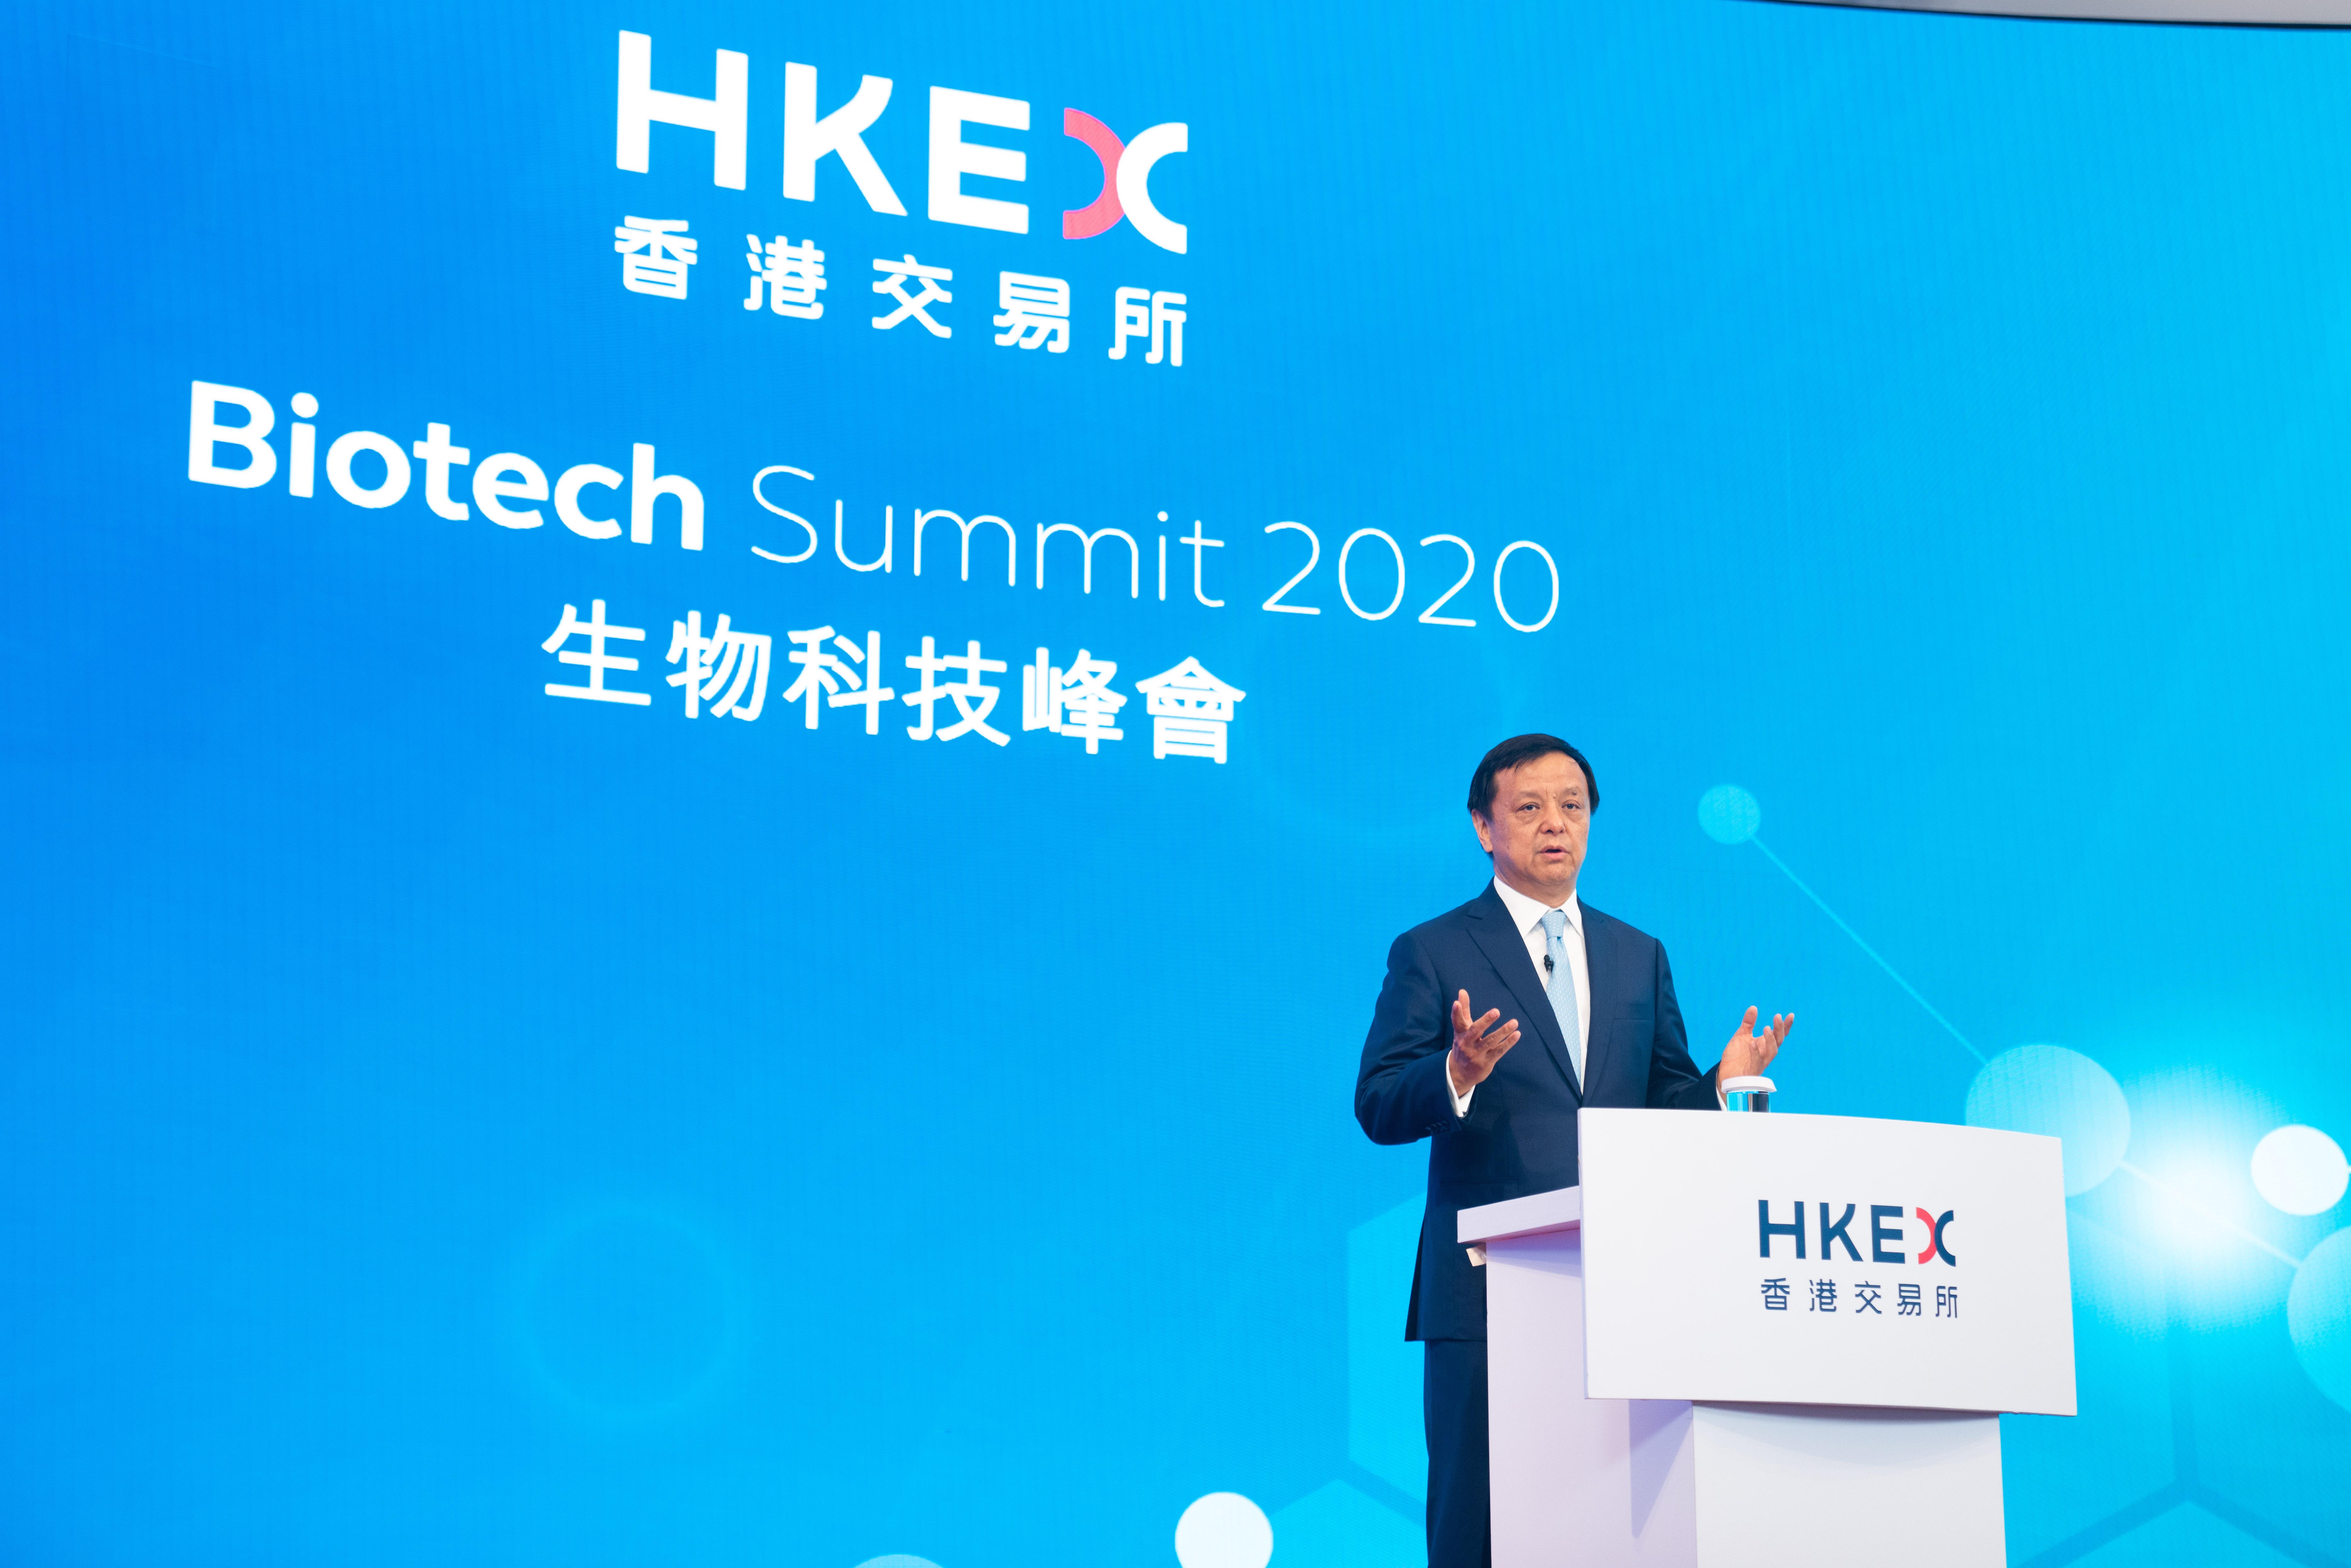 Biotech Summit 2020